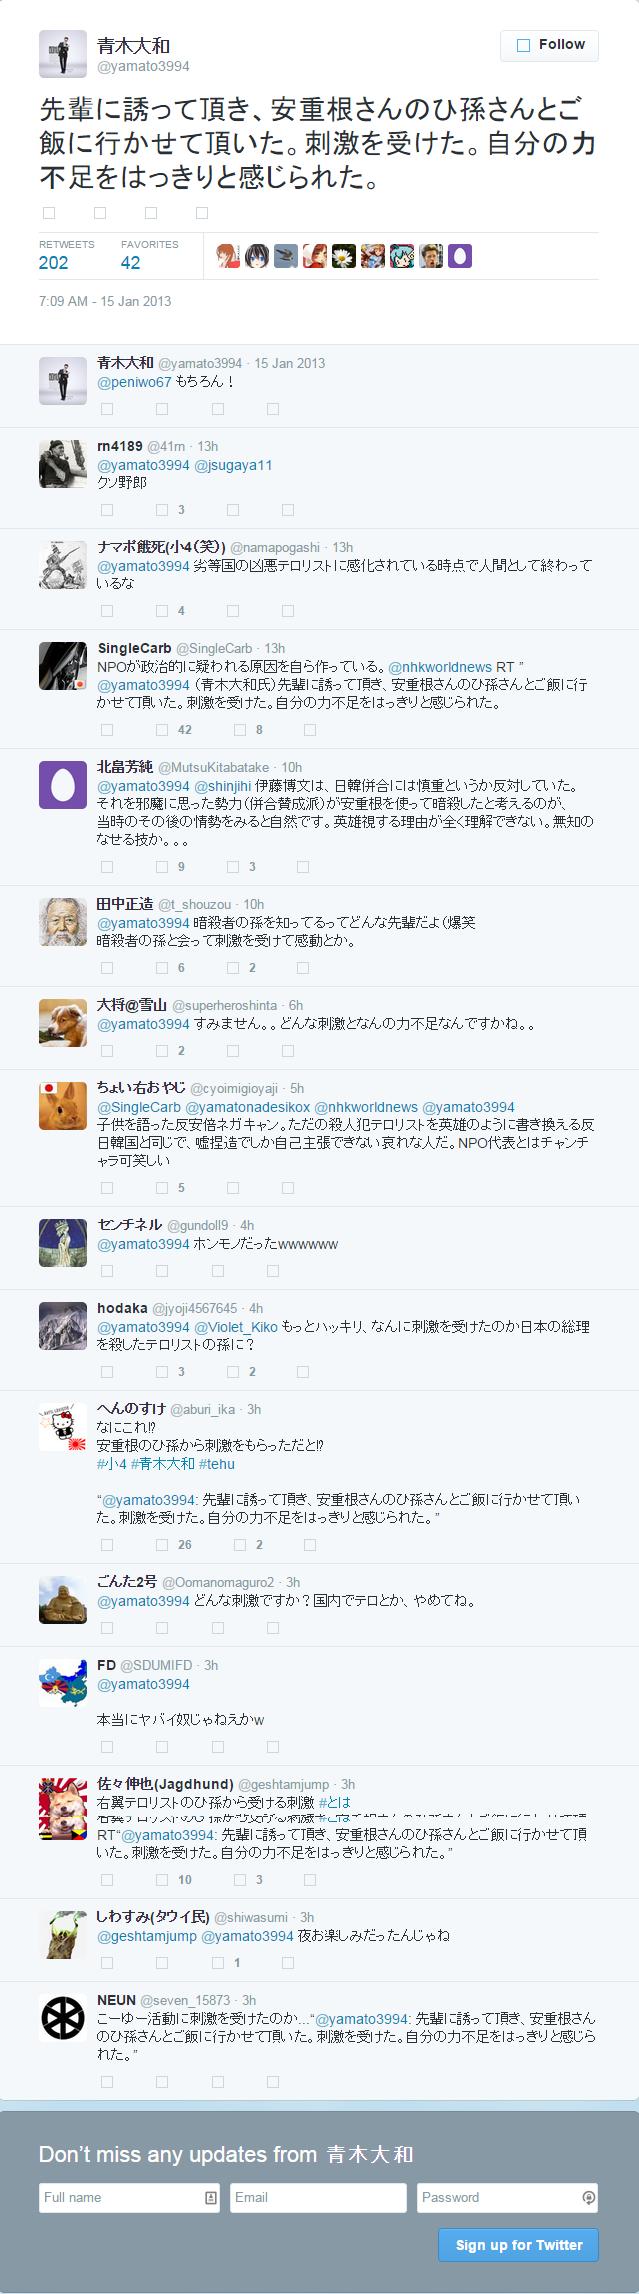 青木大和 on Twitter